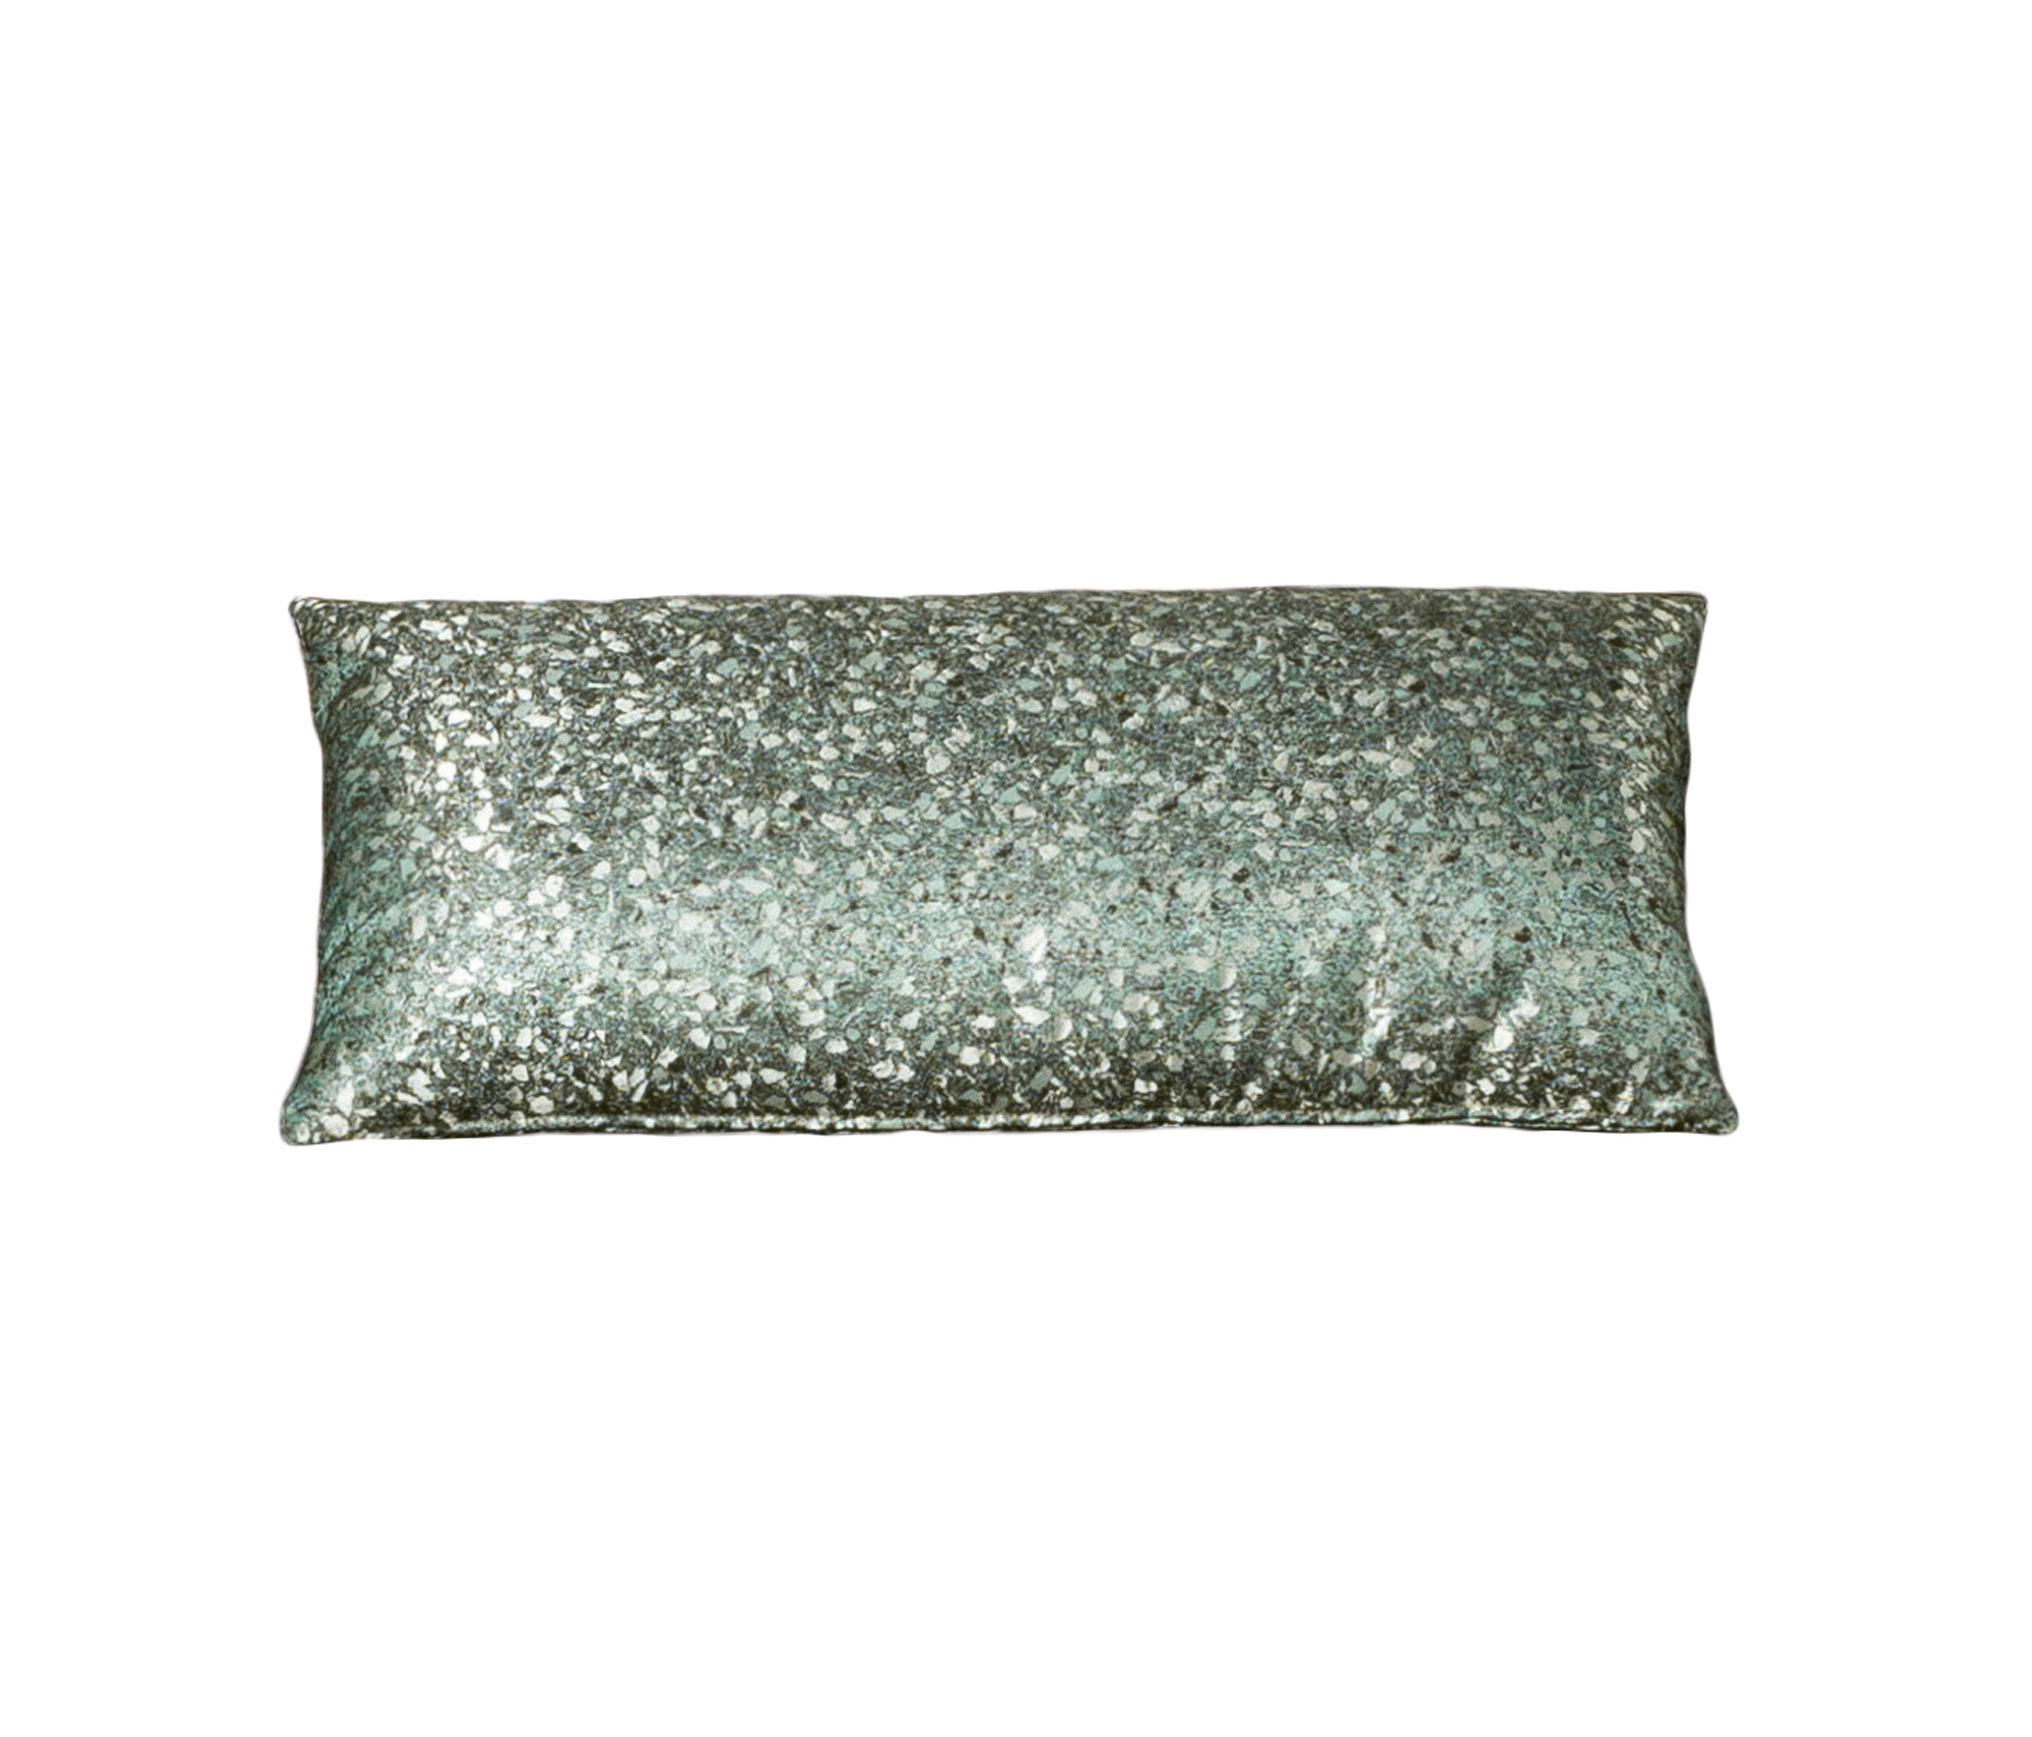 Piccoli Cuscini.Pillows High Quality Designer Pillows Architonic